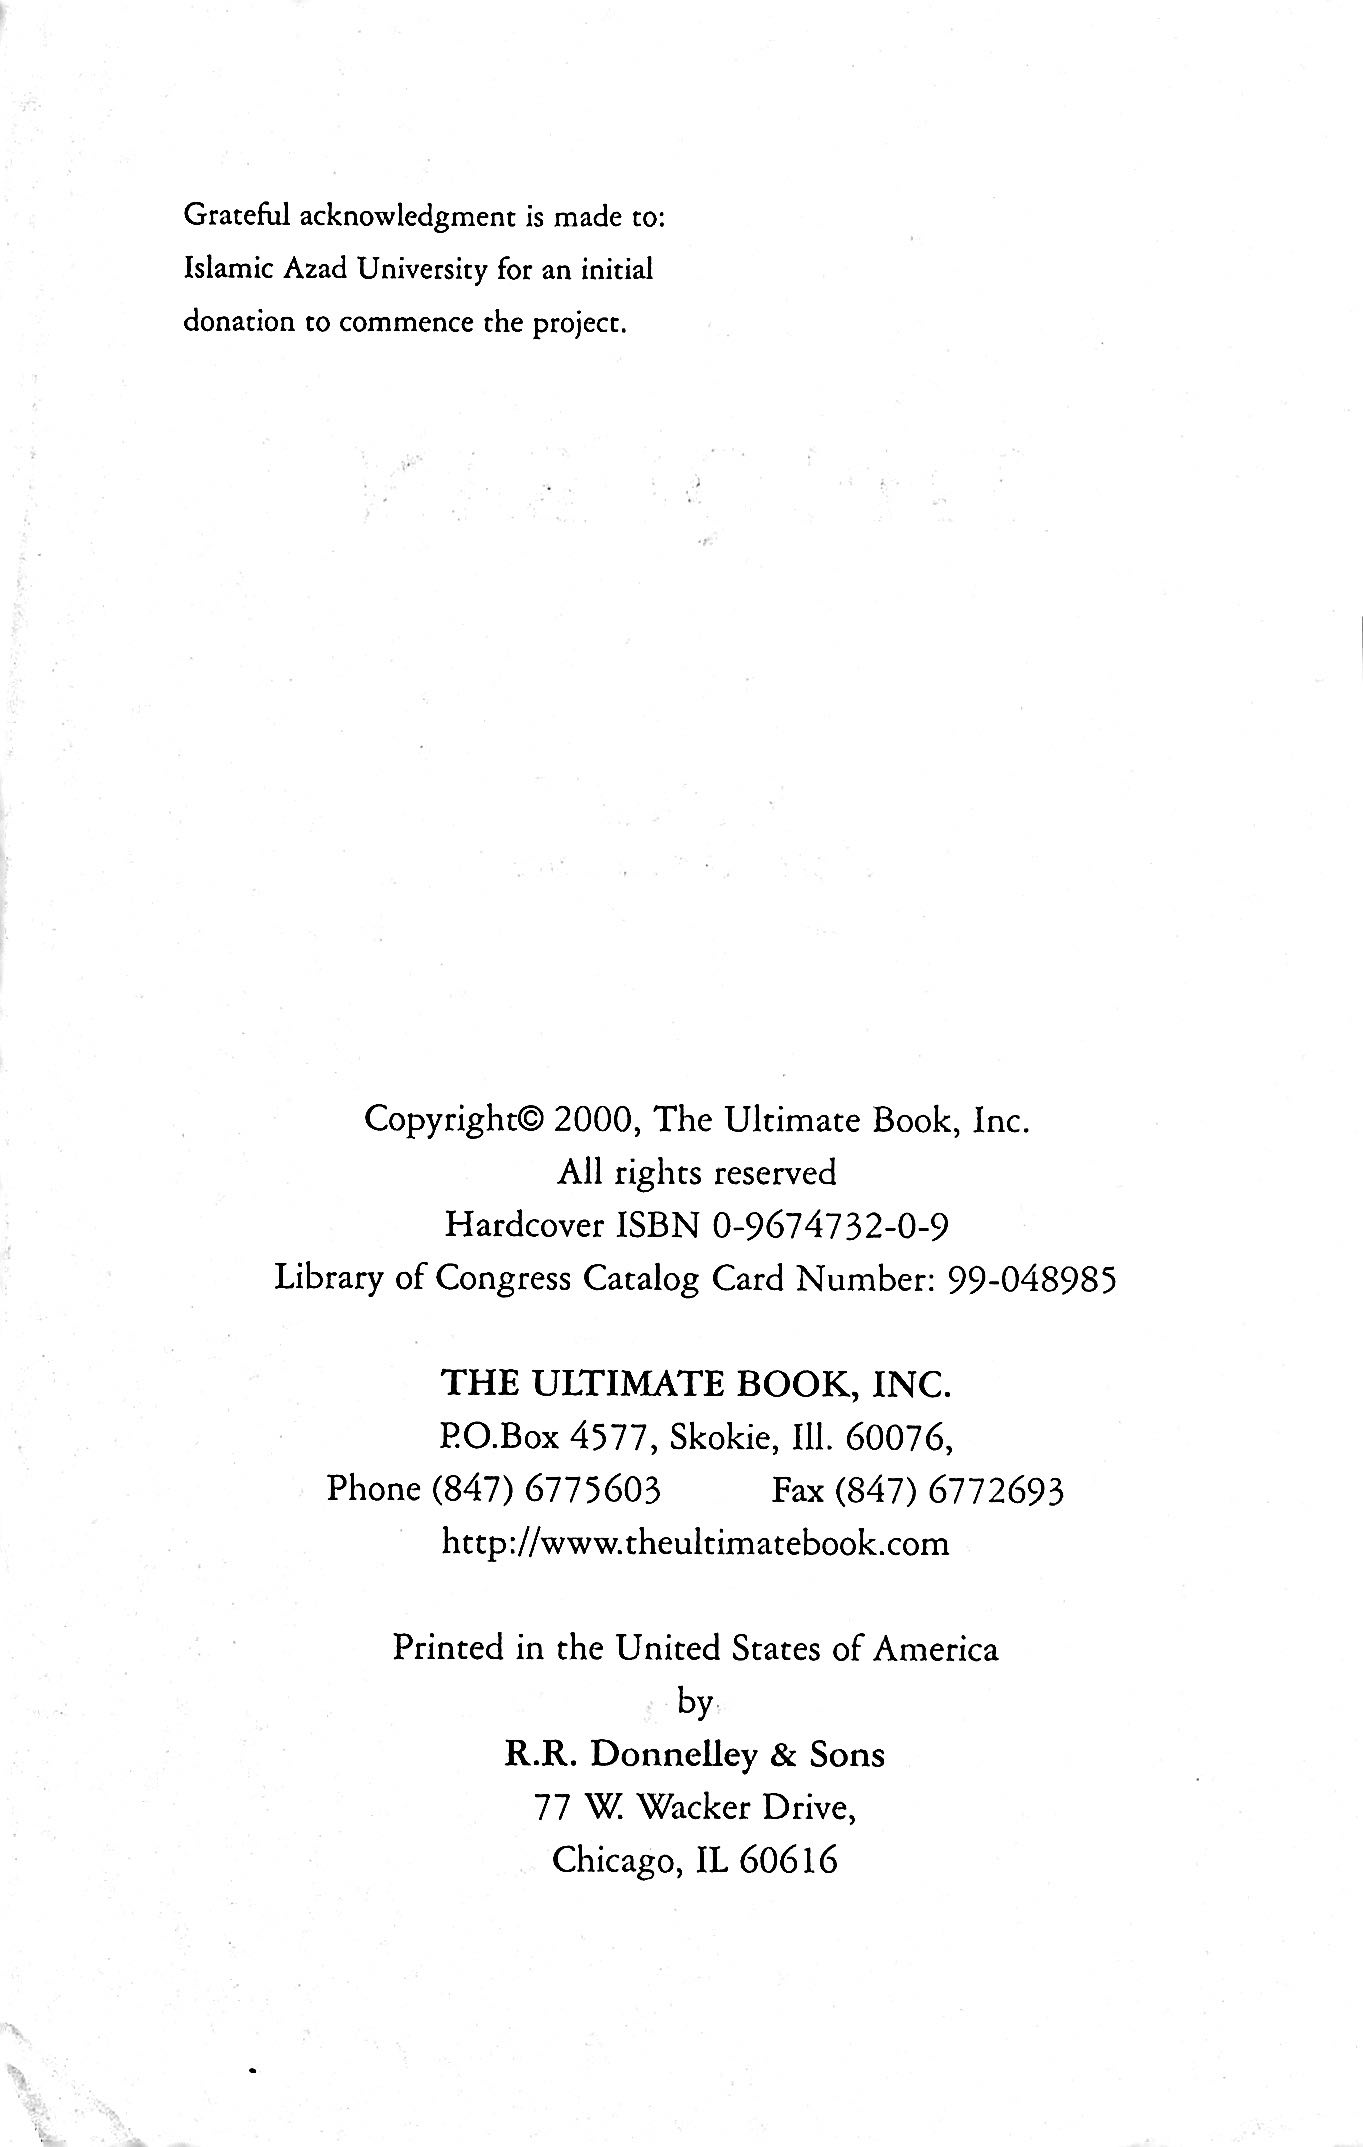 Fazlollah Nikayin 2000 Quran Explorer, Page 2